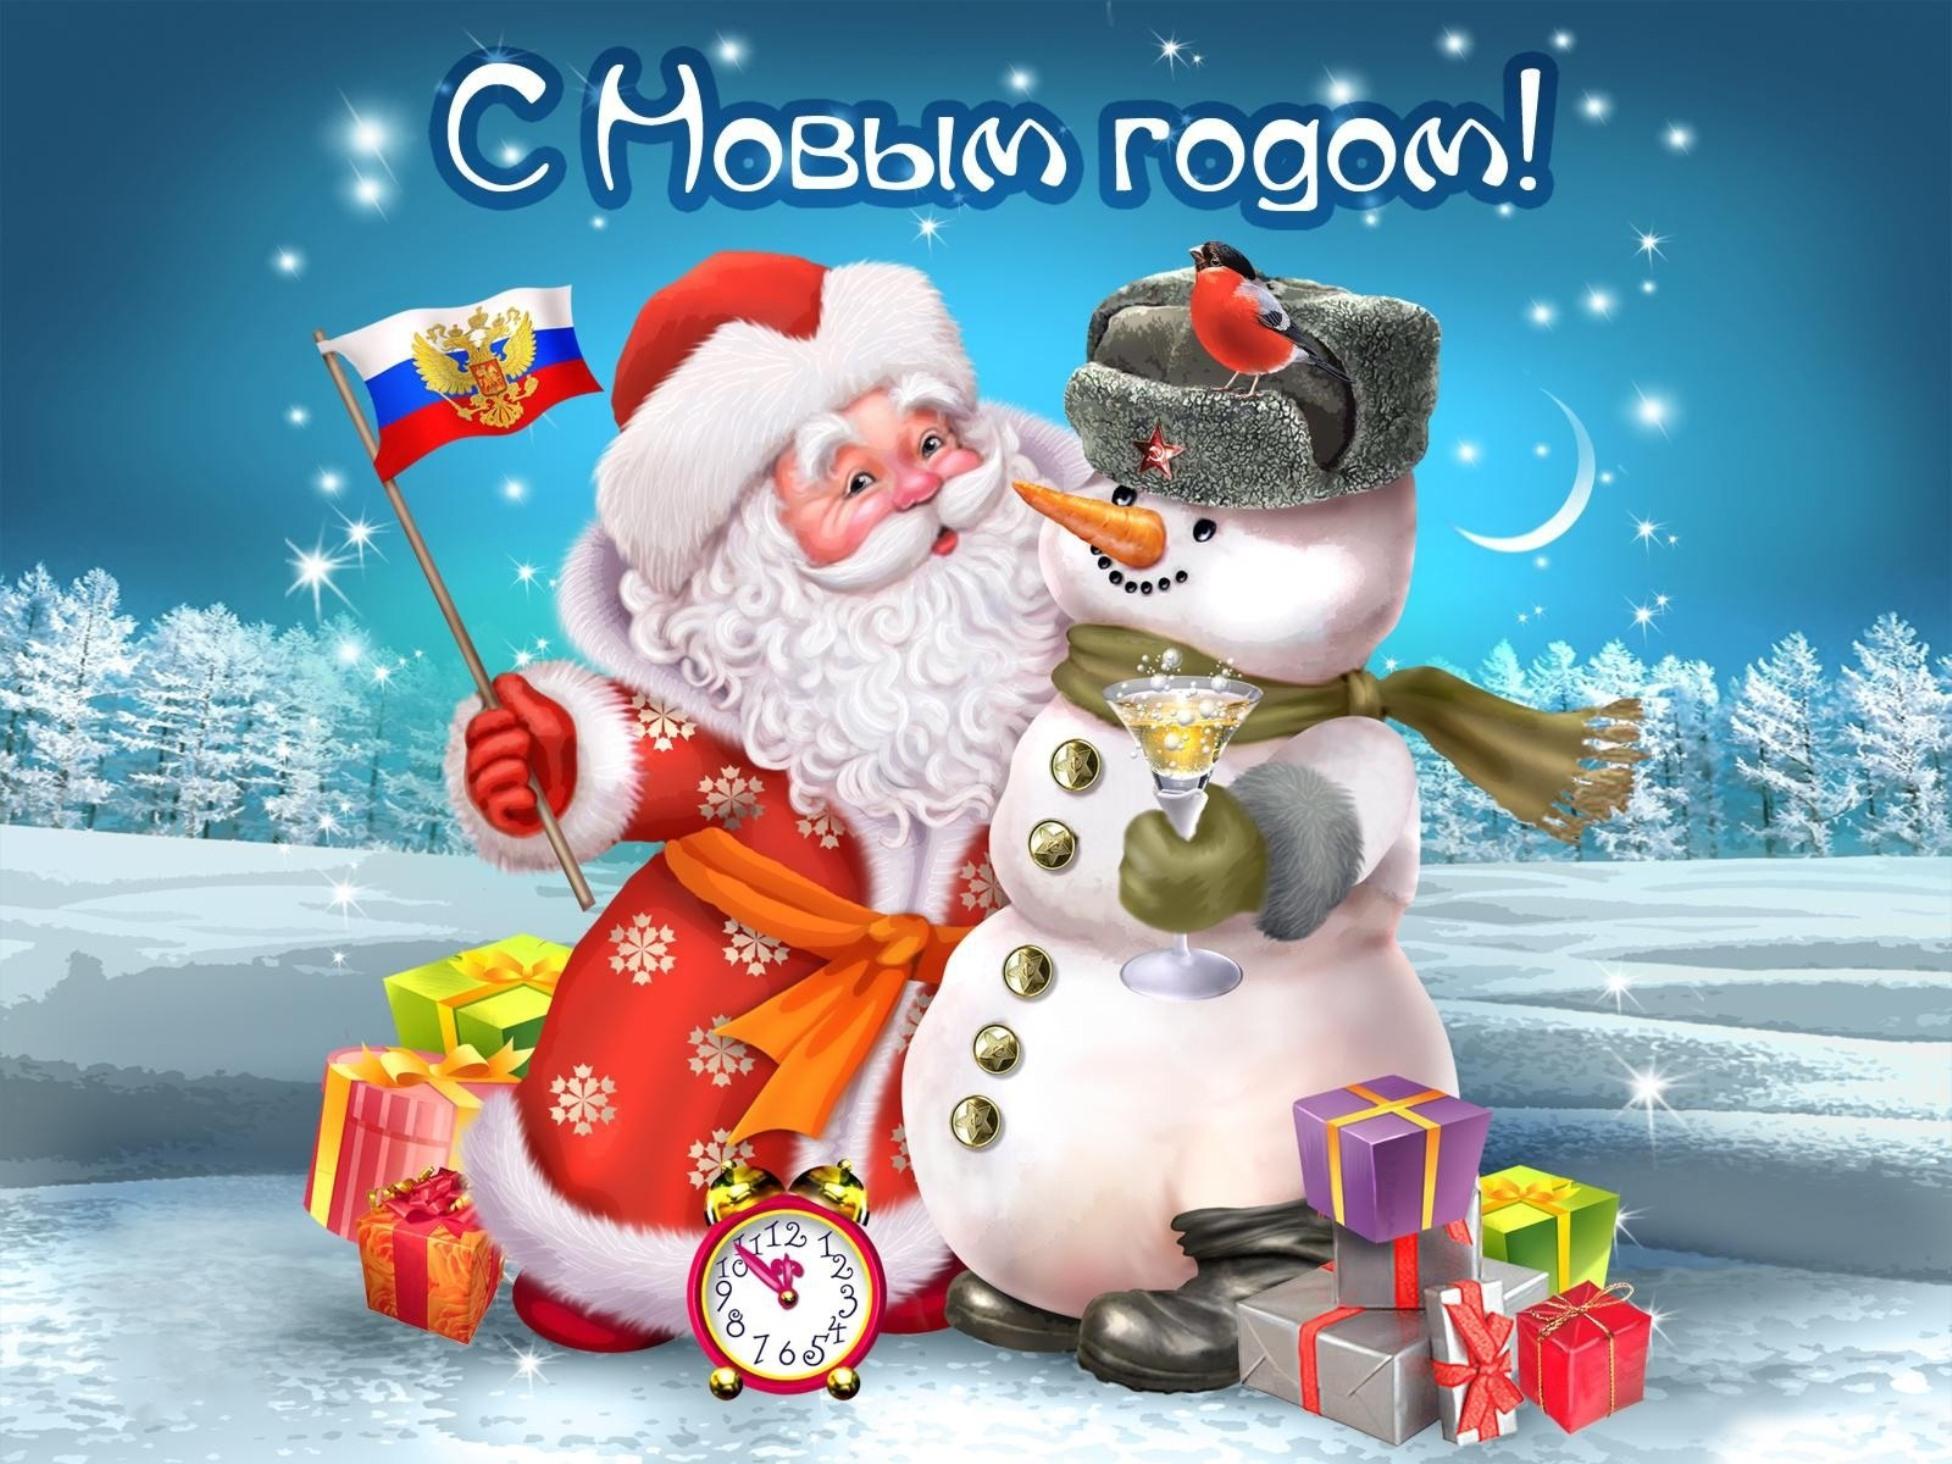 Прикольные картинки деда мороза и снеговика